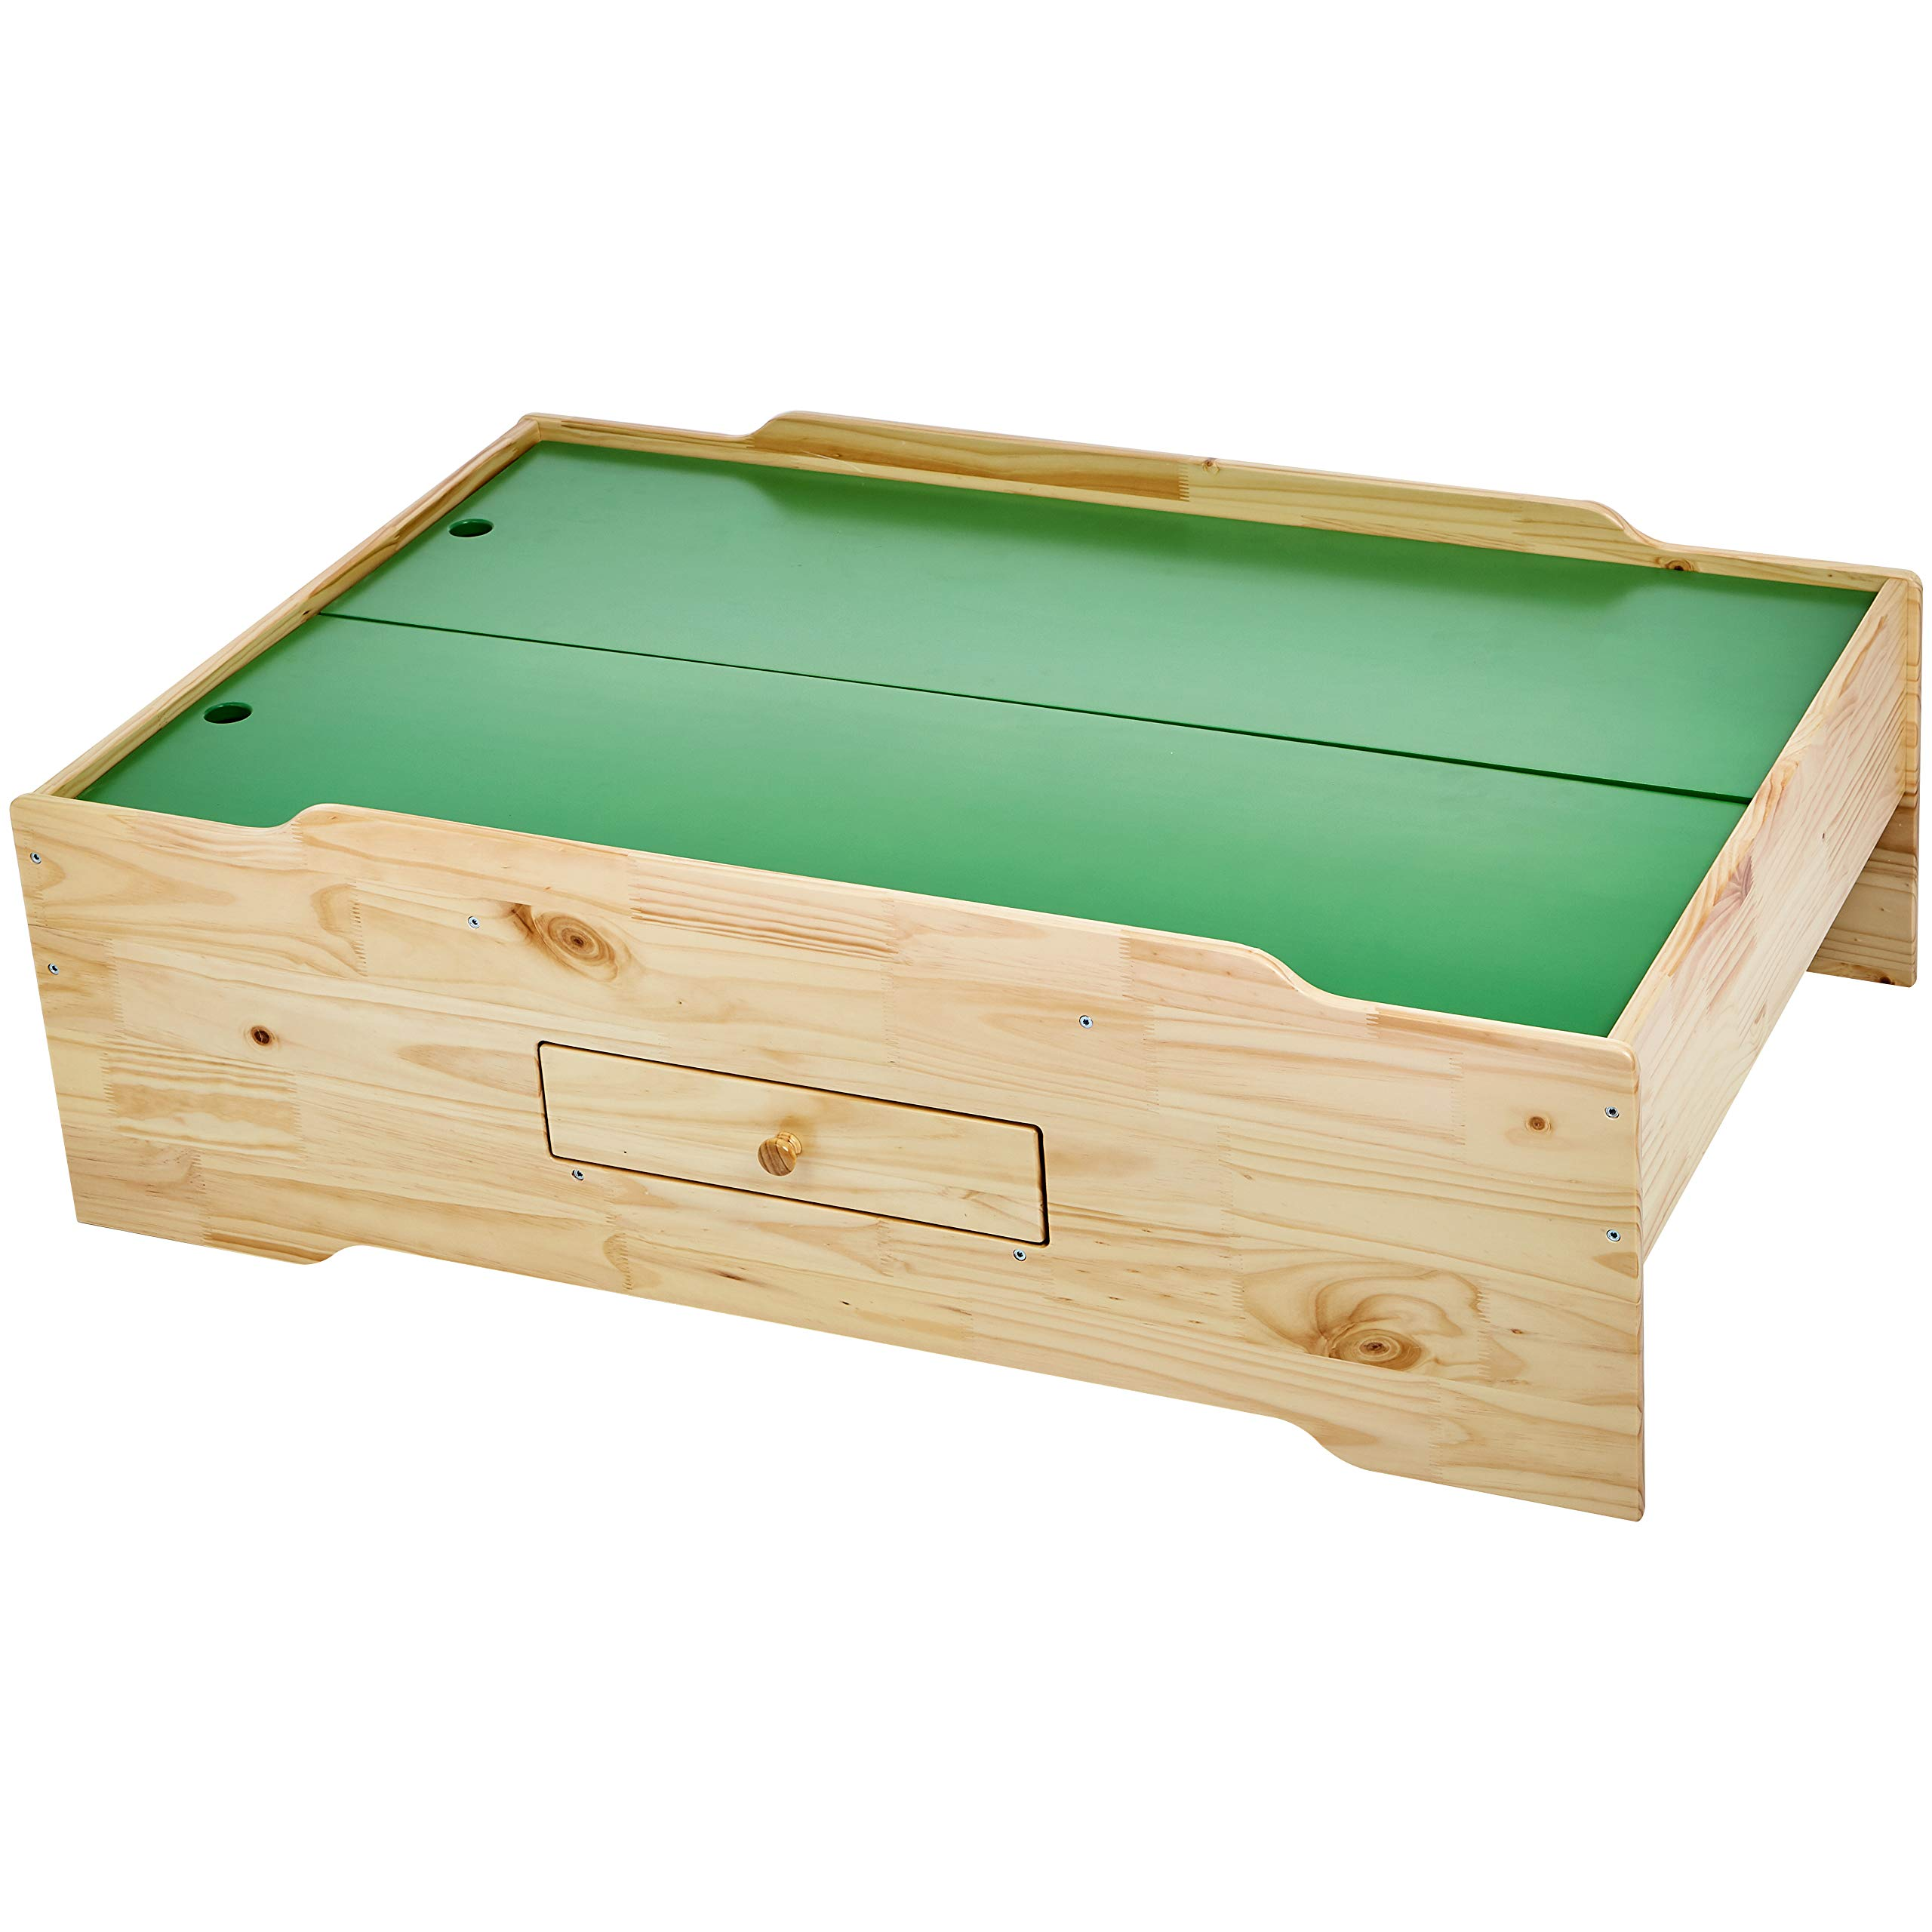 AmazonBasics Wooden Multi-Activity Play Table, Natural by AmazonBasics (Image #3)